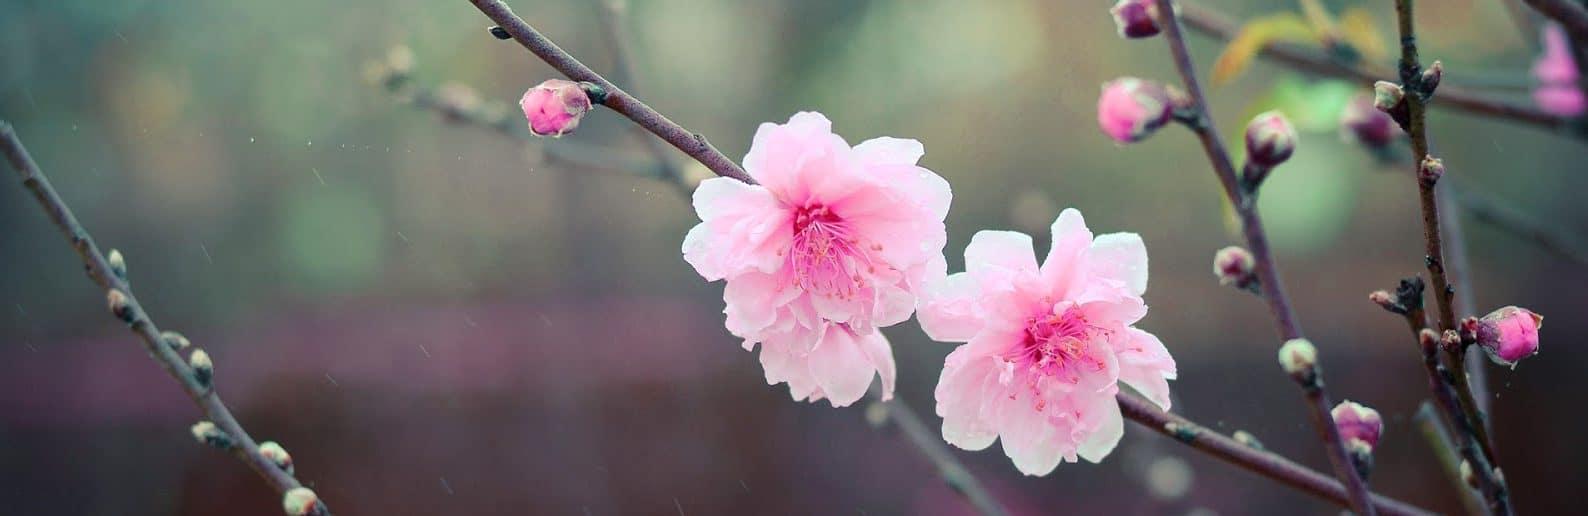 Cherry Blossom wallpaper Peach flowers (2)